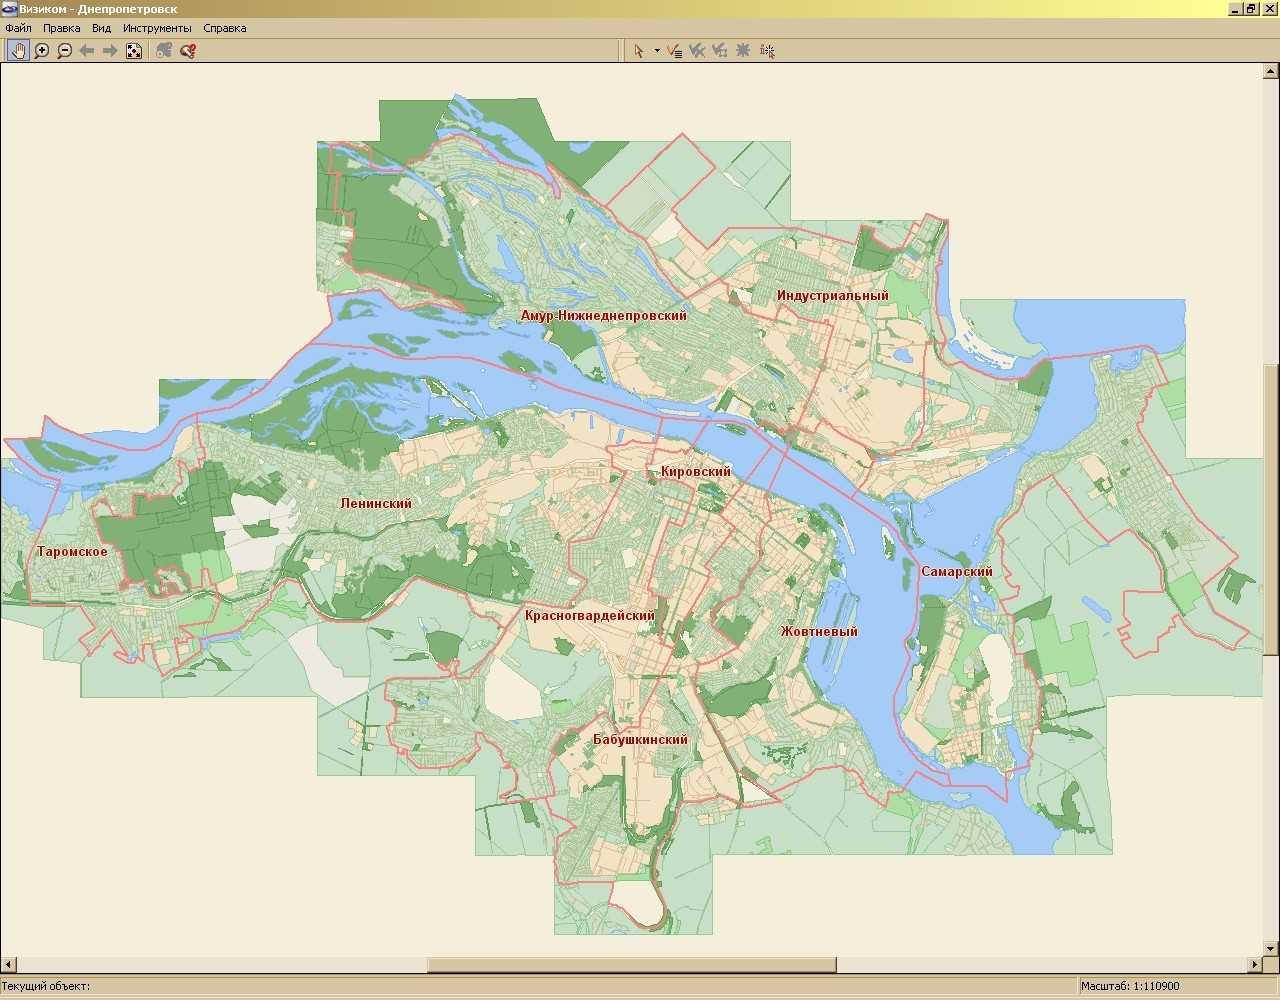 Карта Украины Электронная - polymerservice: http://polymerservice.weebly.com/blog/karta-ukraini-elektronnaya